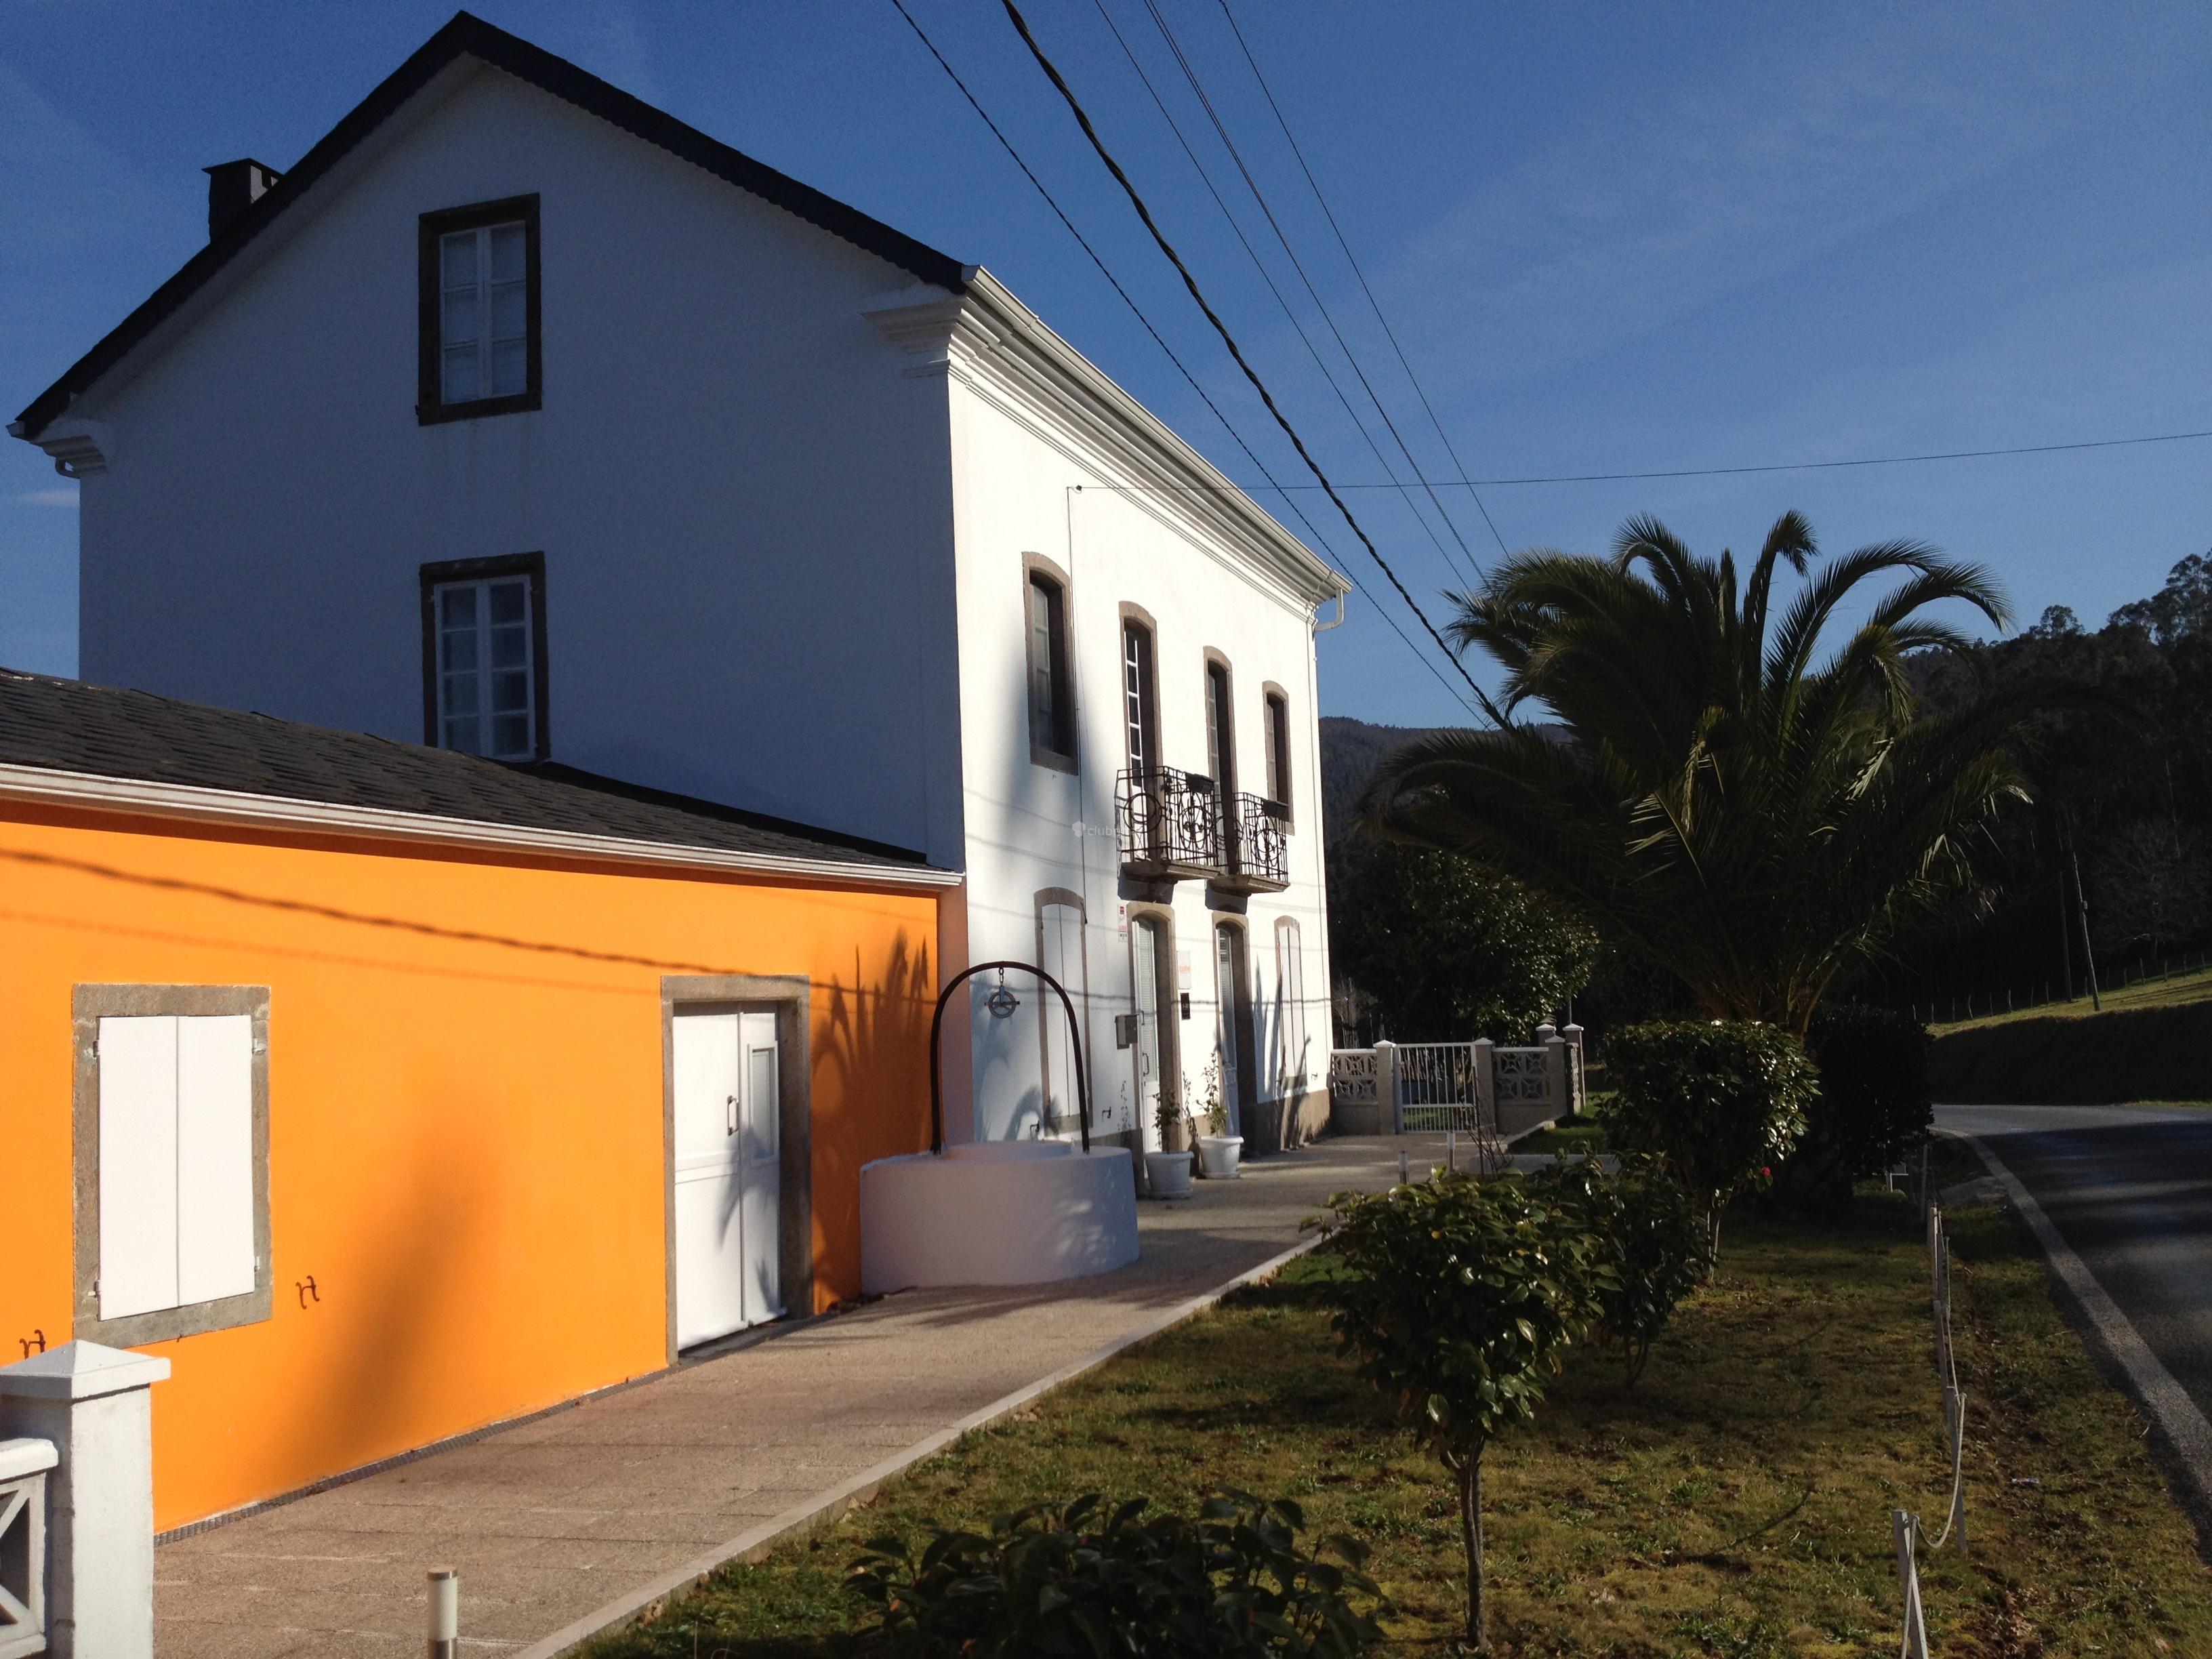 Fotos de aguamiel casa rural a coru a moeche clubrural - Casa de sixto paderne ...